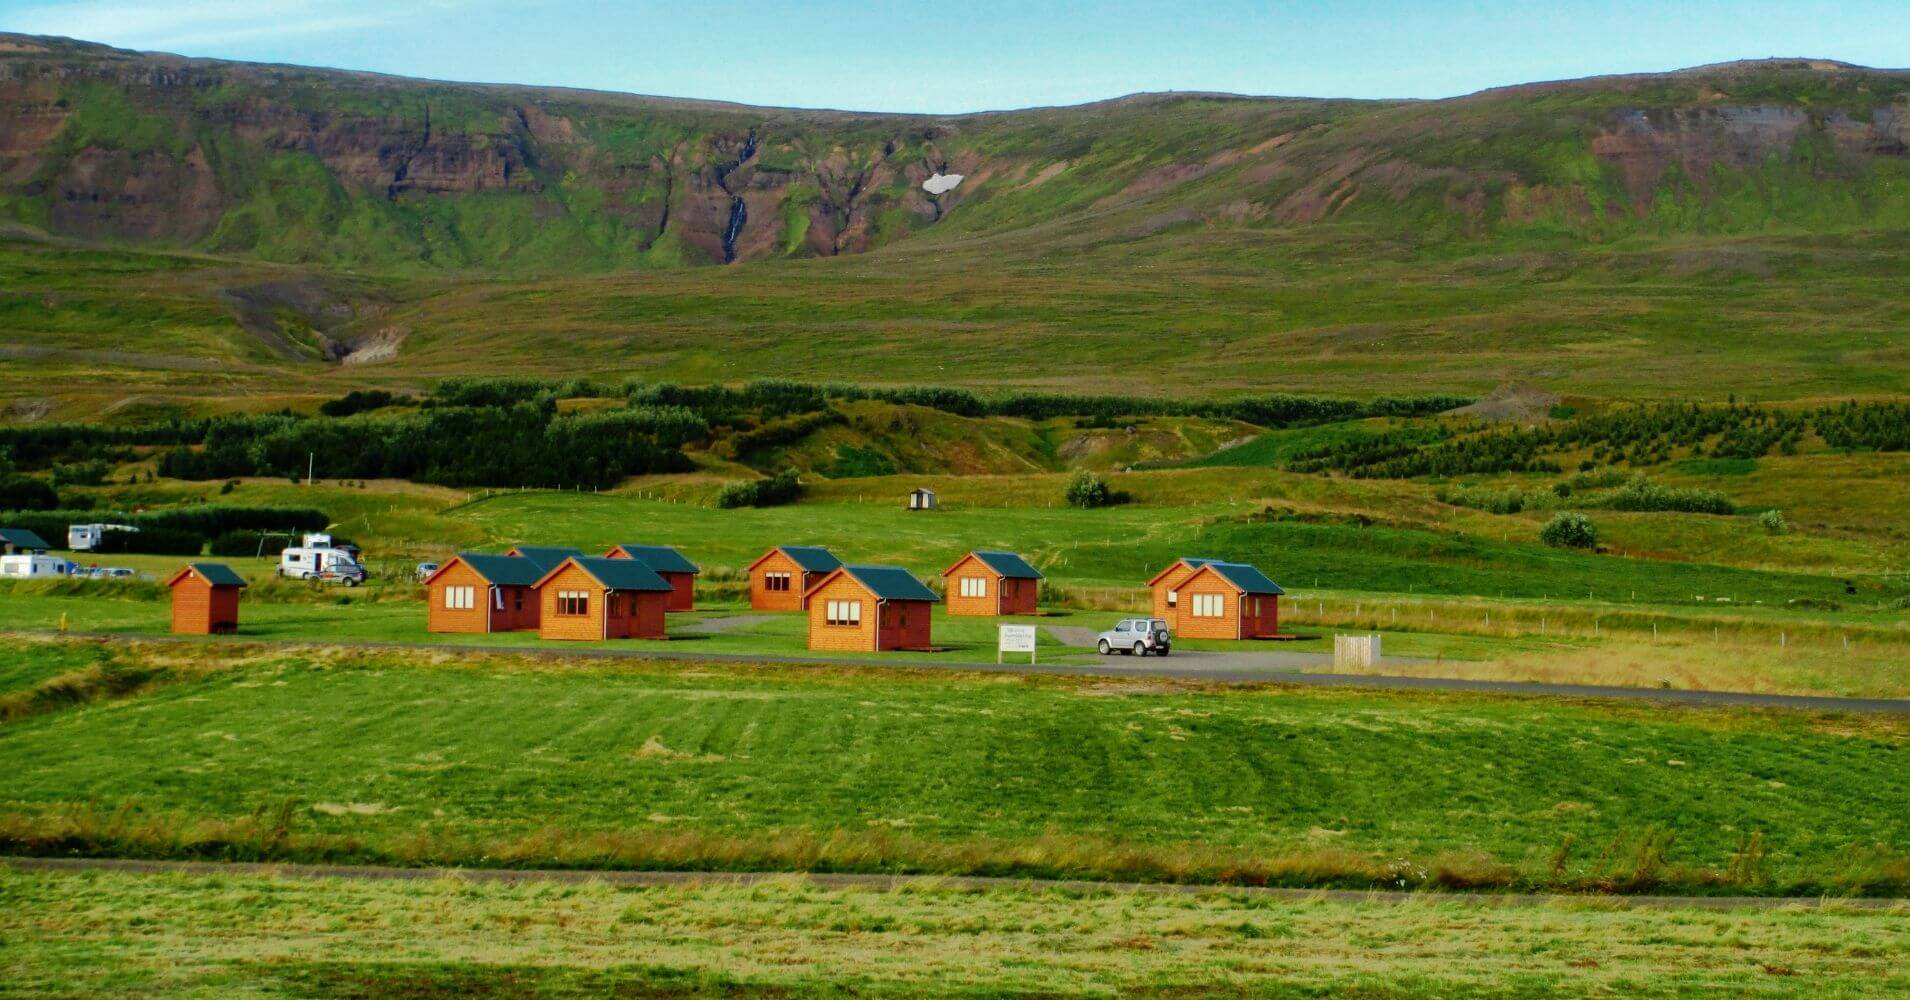 Camping Península de Vatnsnes. Hvammstangi, Norðurland Vestra. Islandia.